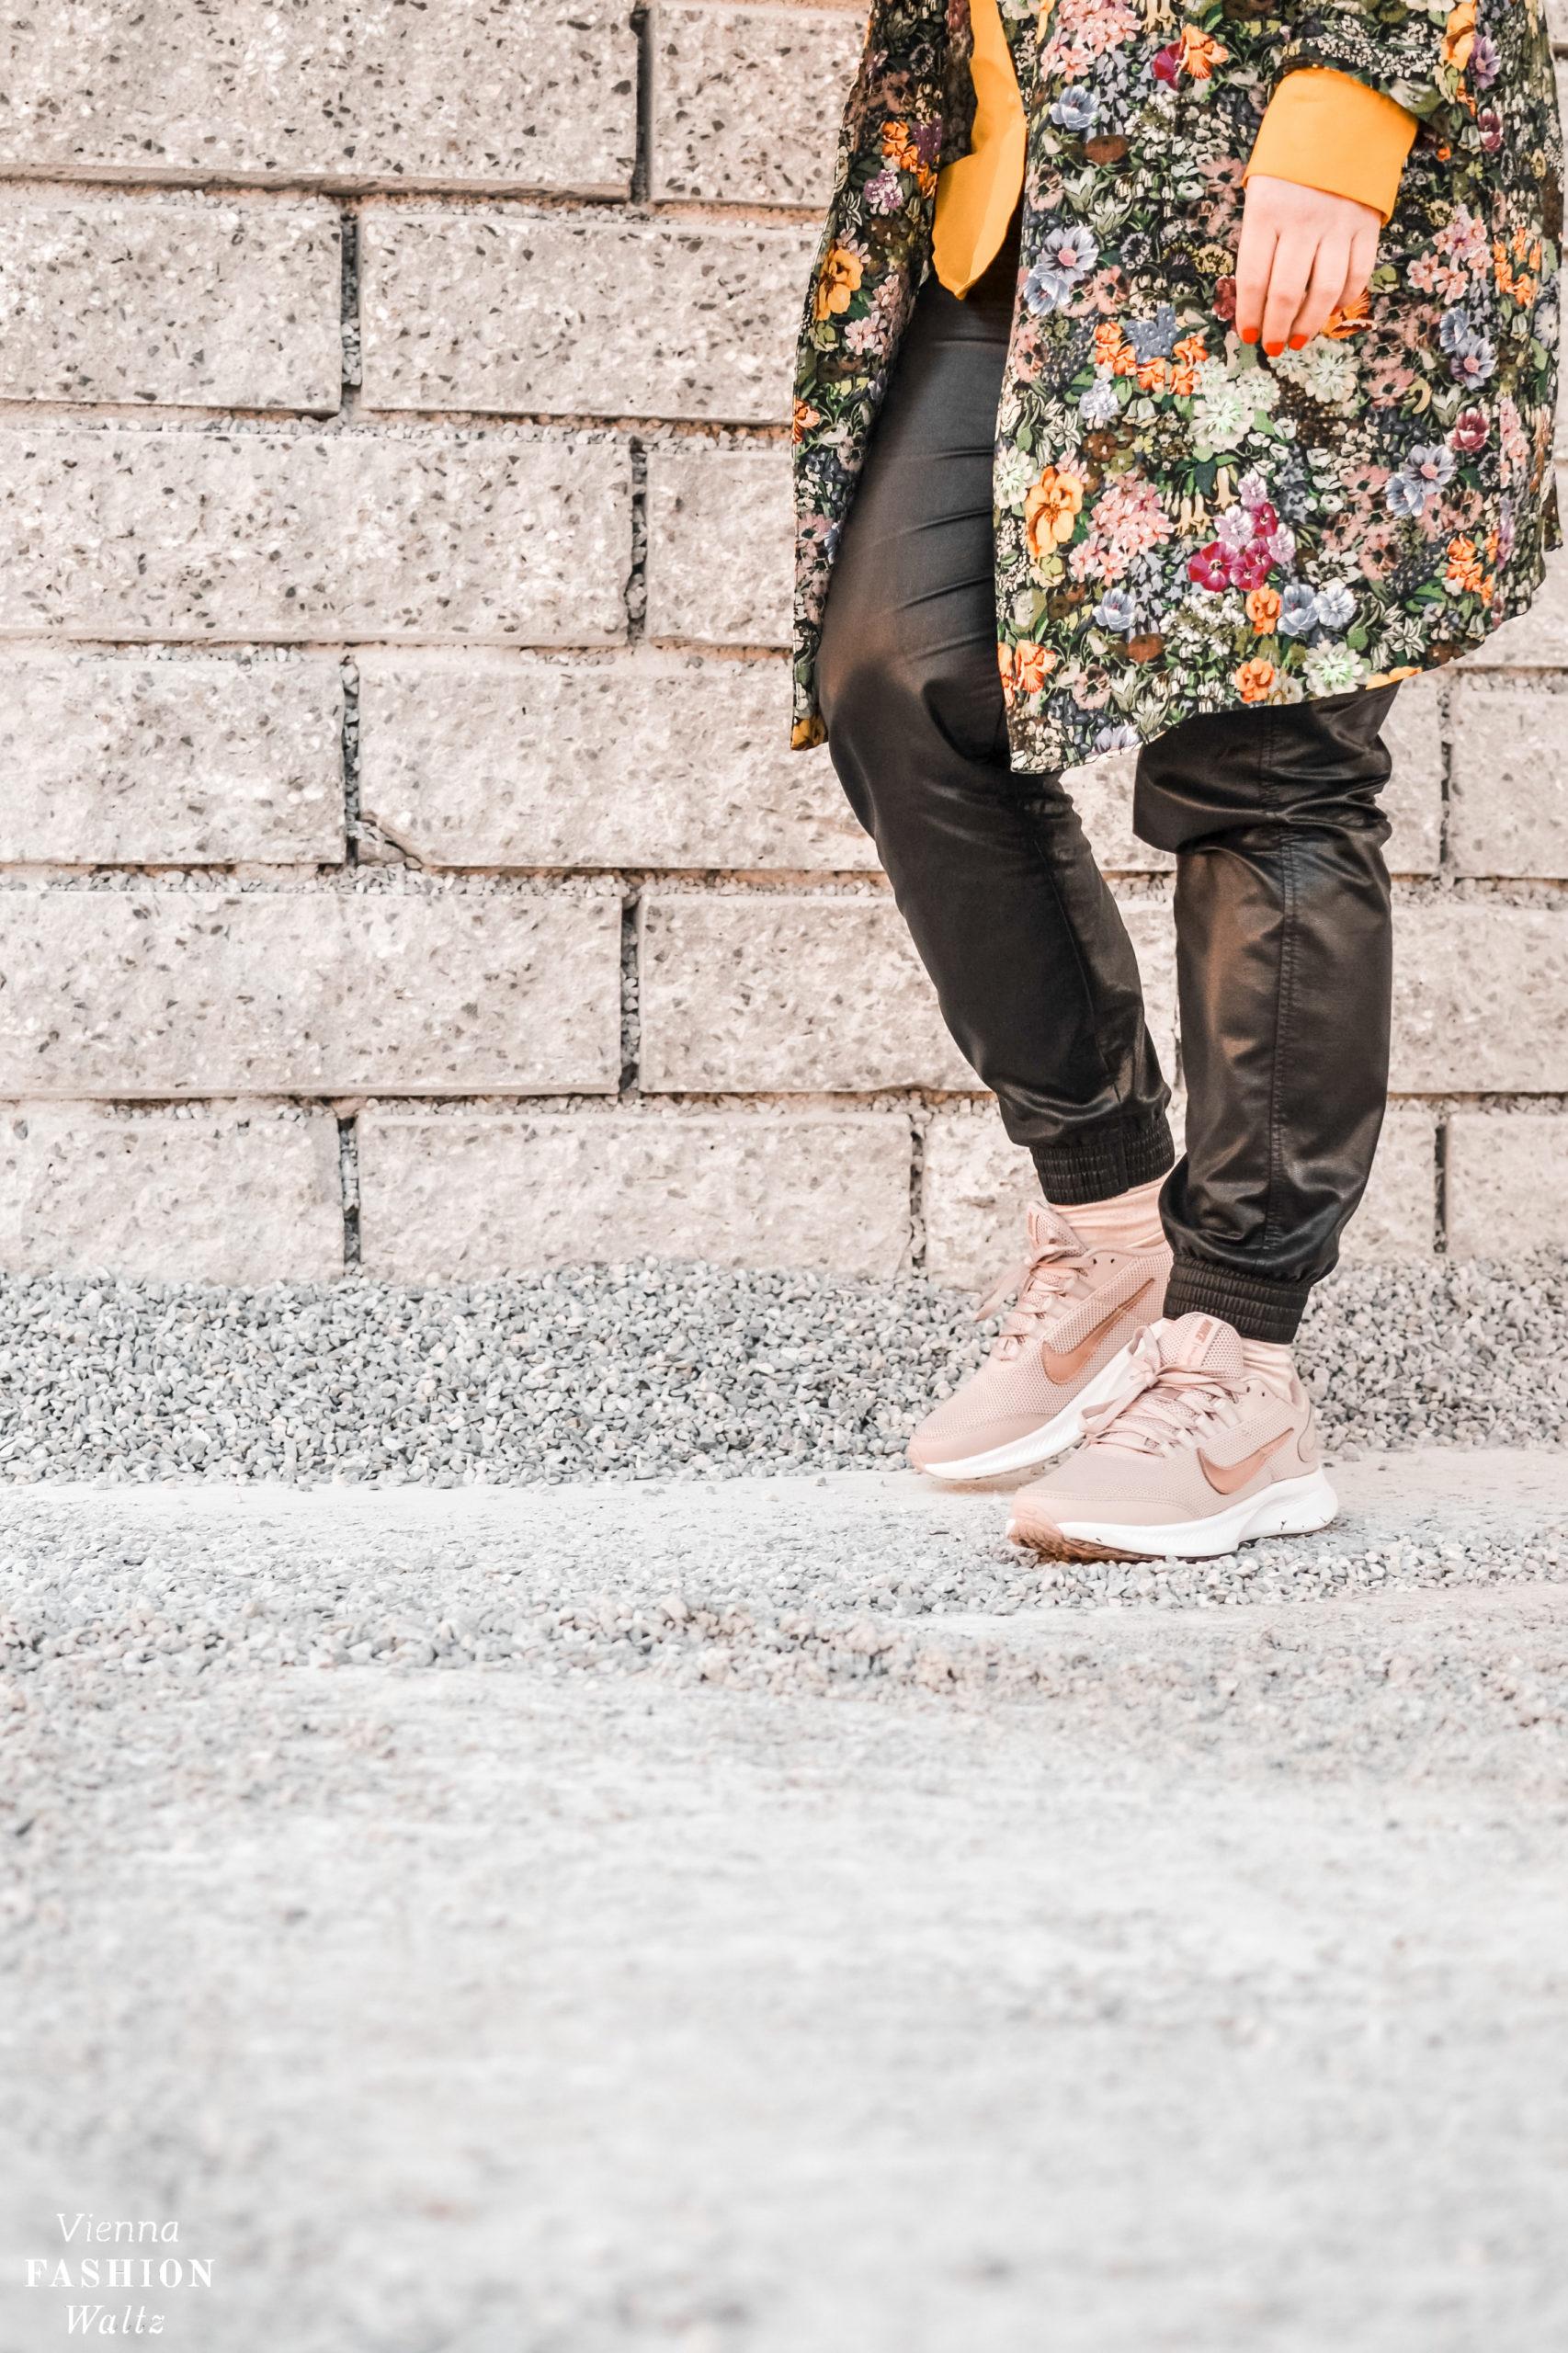 Leder, Hose, Sneakers in Rosa von Nike via Deichmann